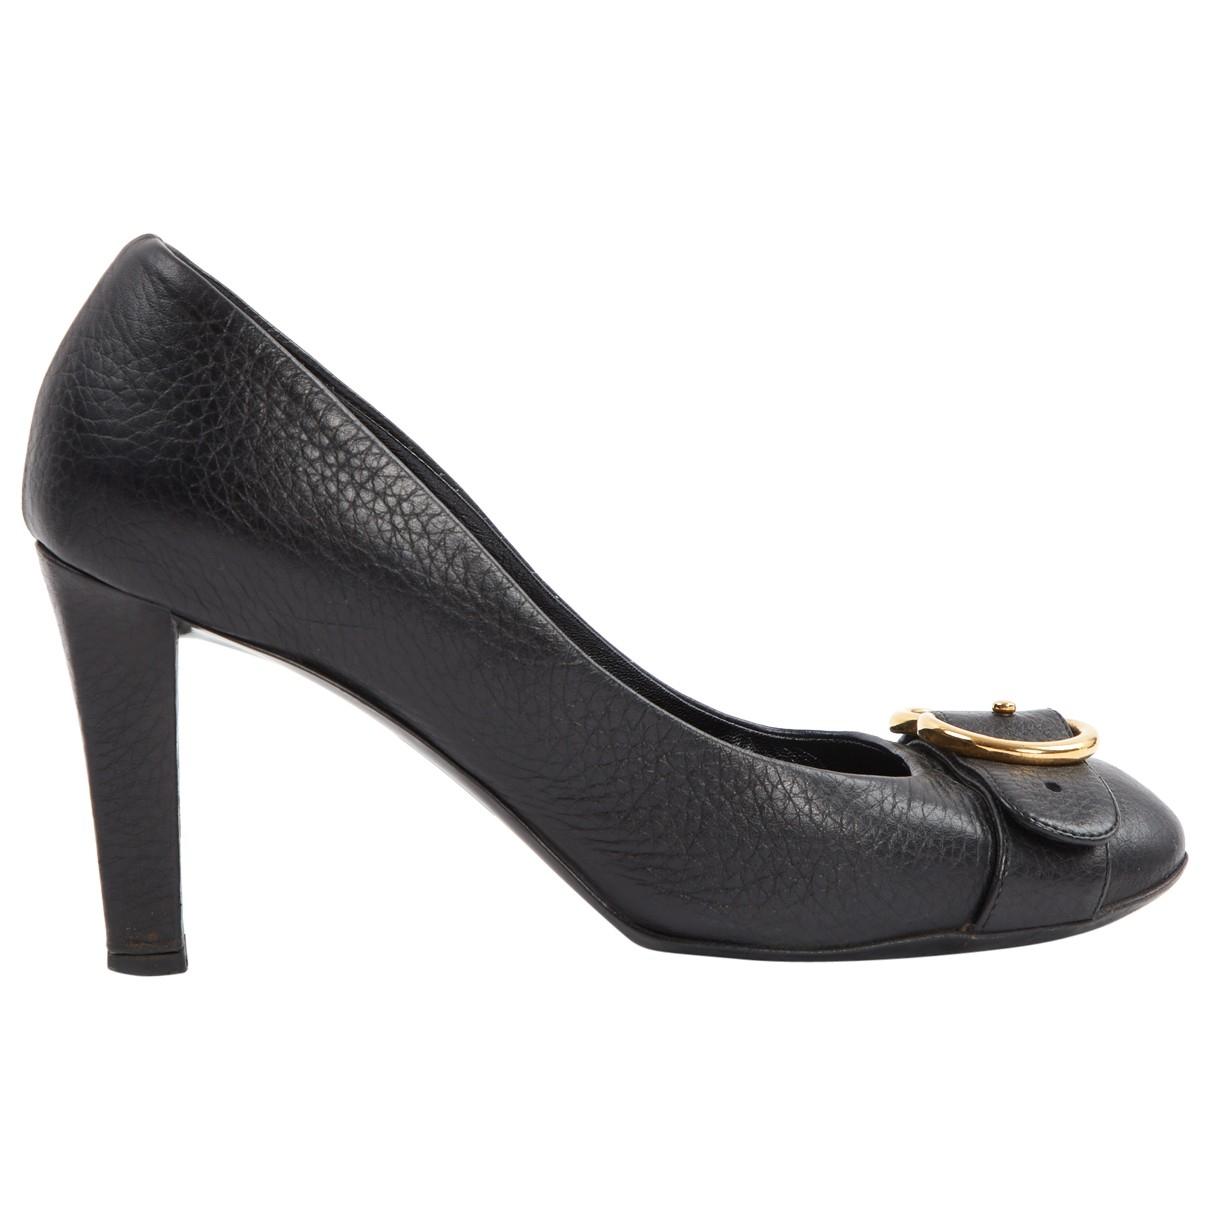 Gucci \N Black Leather Heels for Women 38.5 EU